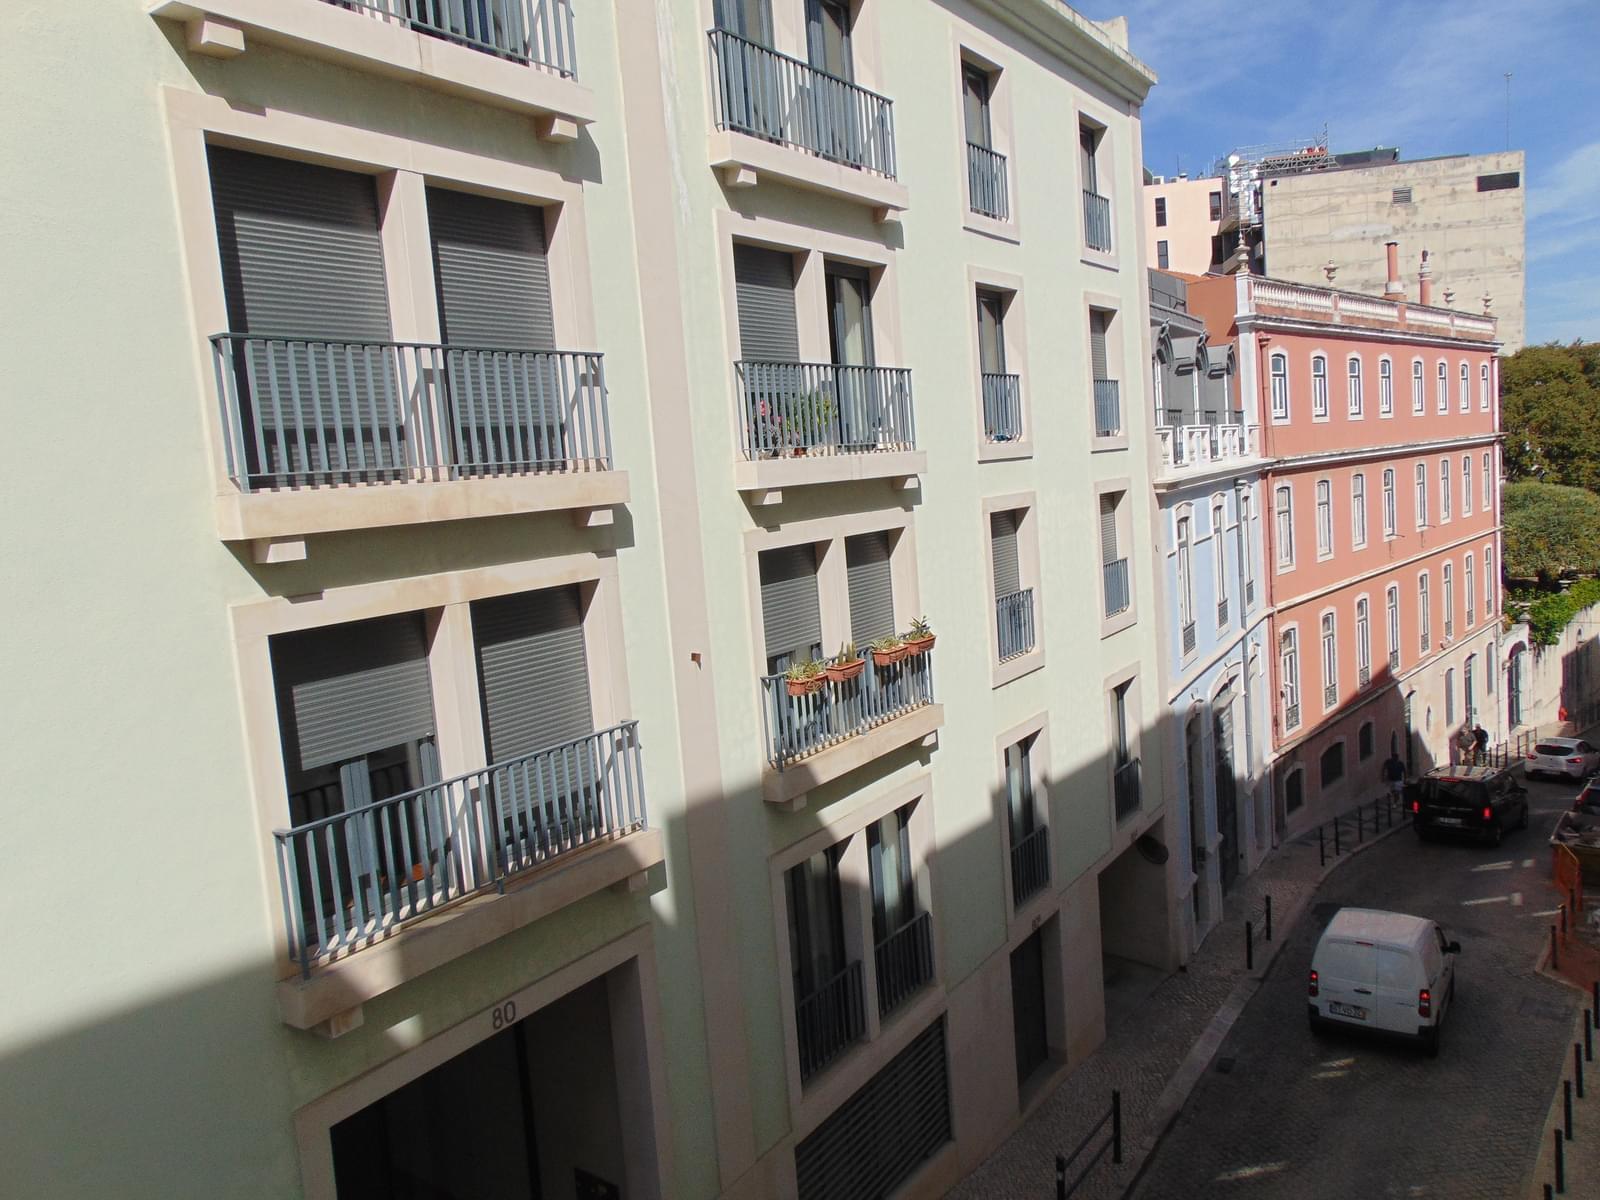 pf18152-apartamento-t2-lisboa-9a64880f-9eee-4664-839a-fe53da32bd83